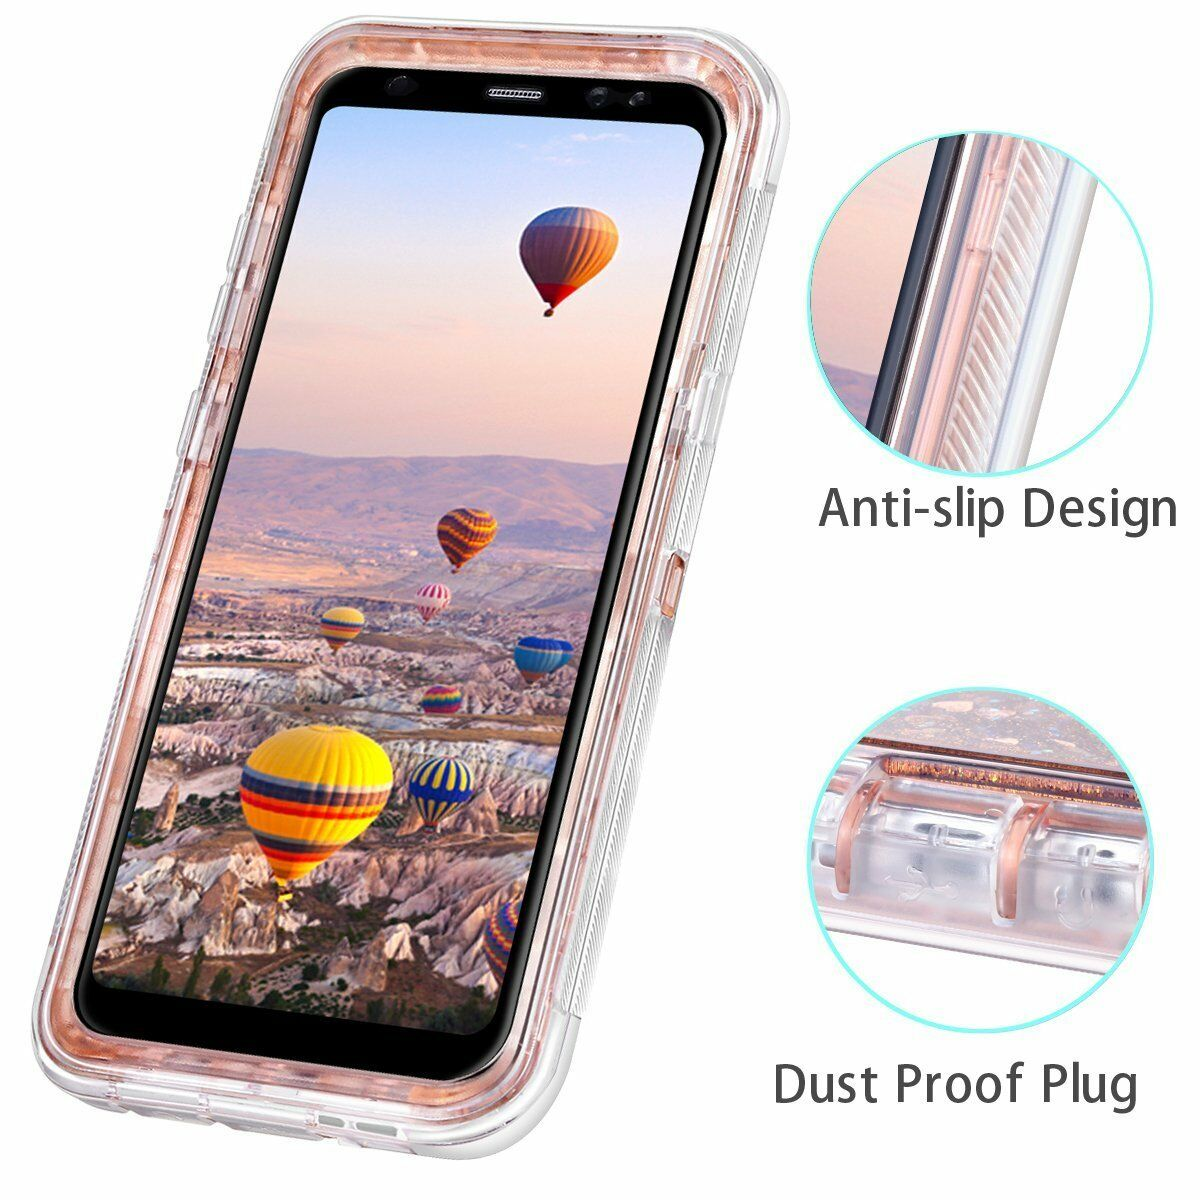 Купить Unbranded/Generic - Samsung Galaxy S8 Plus Note 9 8 Liquid Glitter Defender Case Clip Fits Otterbox